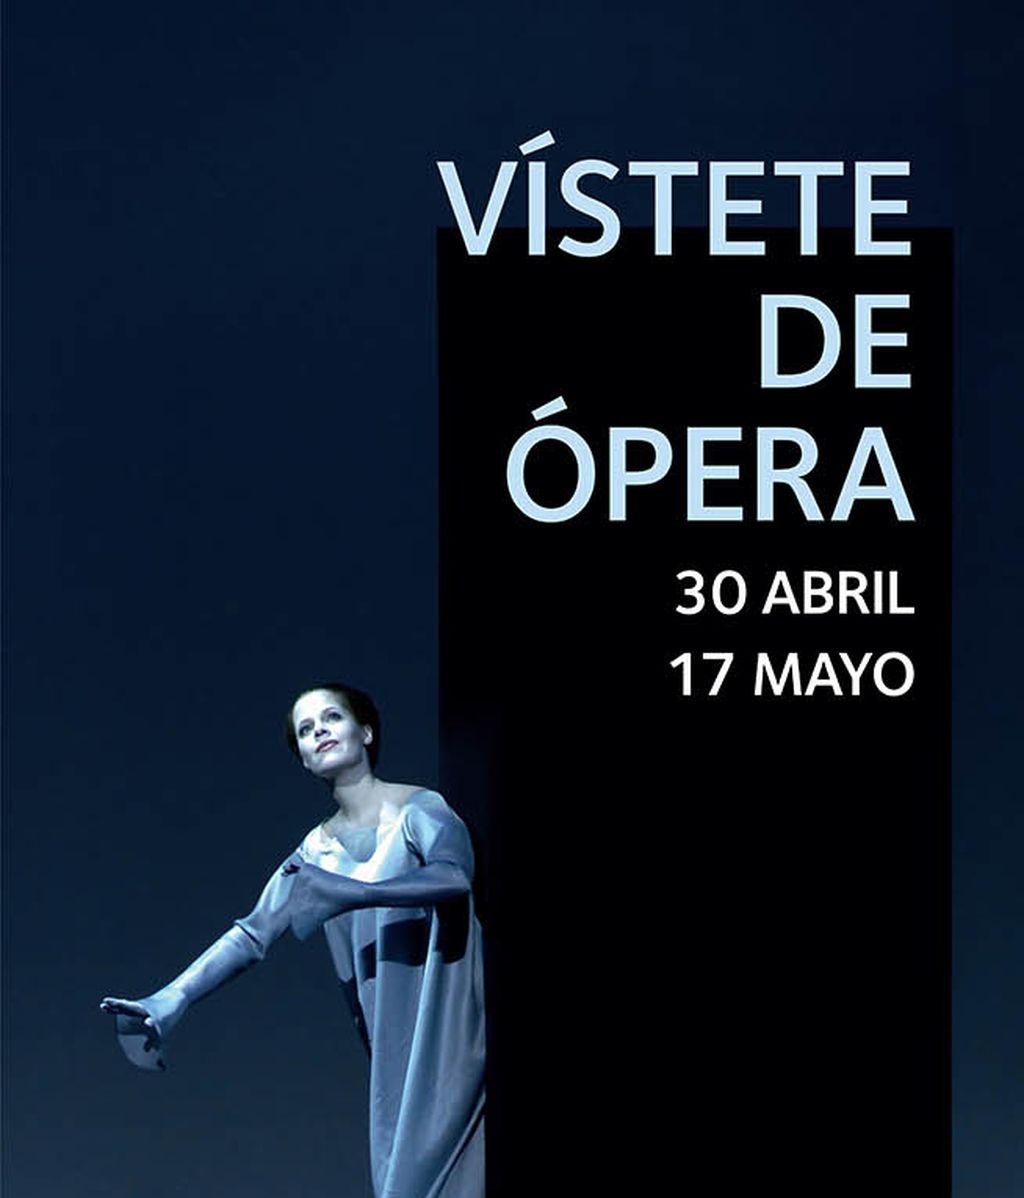 Vístete de ópera